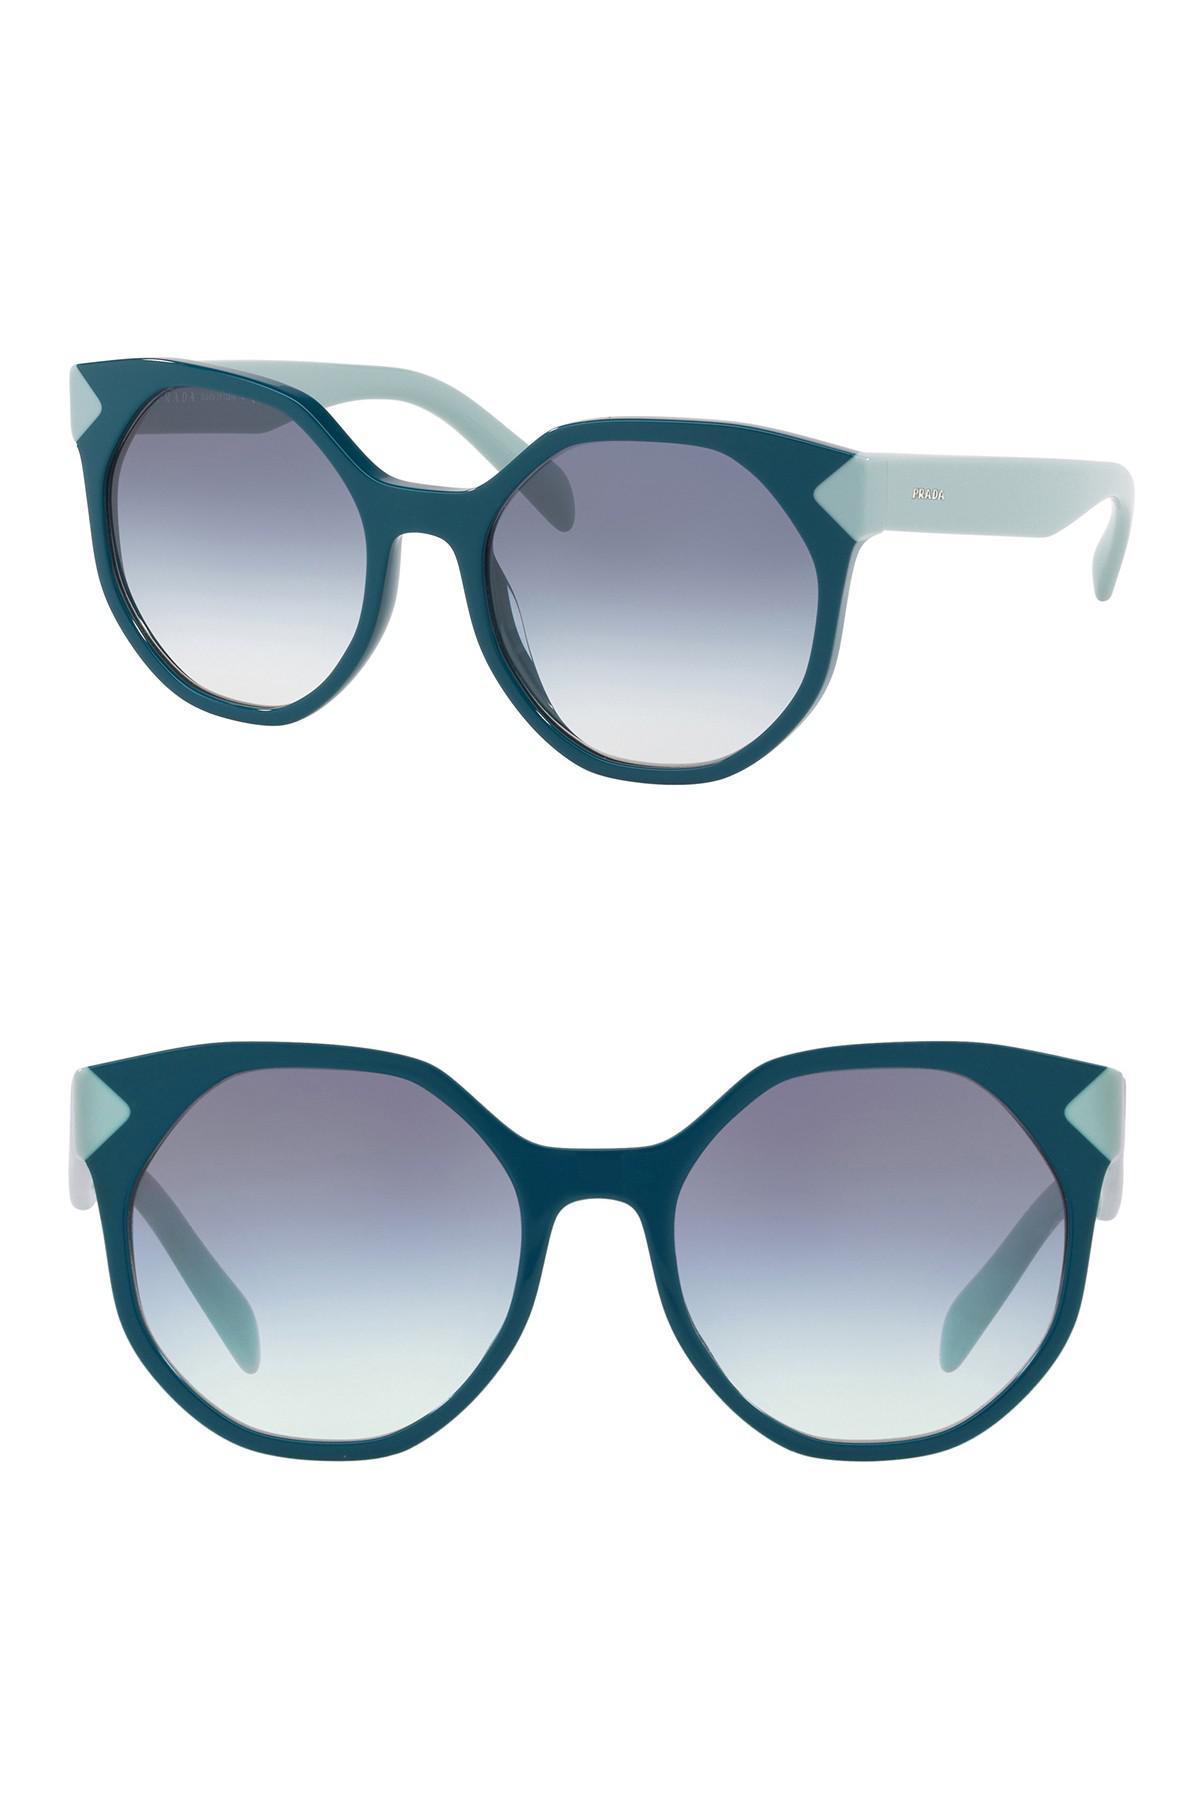 9e75c8c47202 Prada - Green 55mm Geo Round Cat Eye Sunglasses for Men - Lyst. View  fullscreen